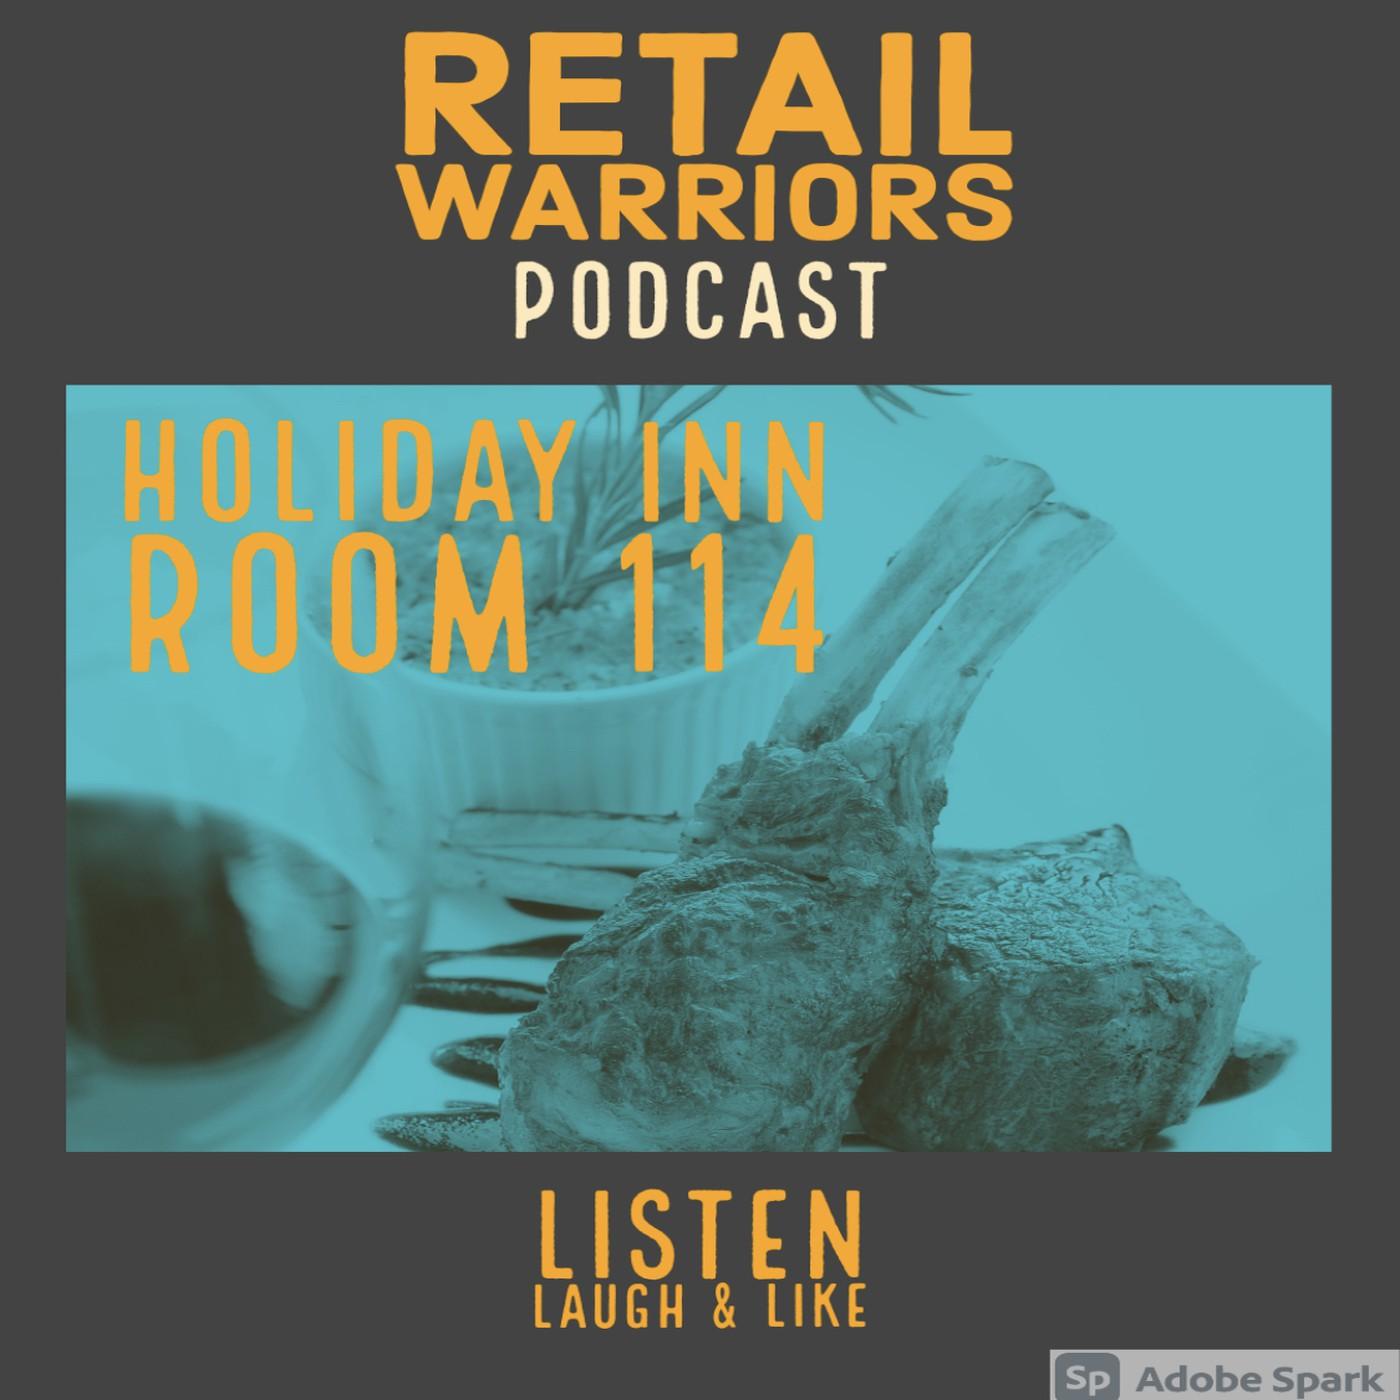 Retail Warriors Podcast